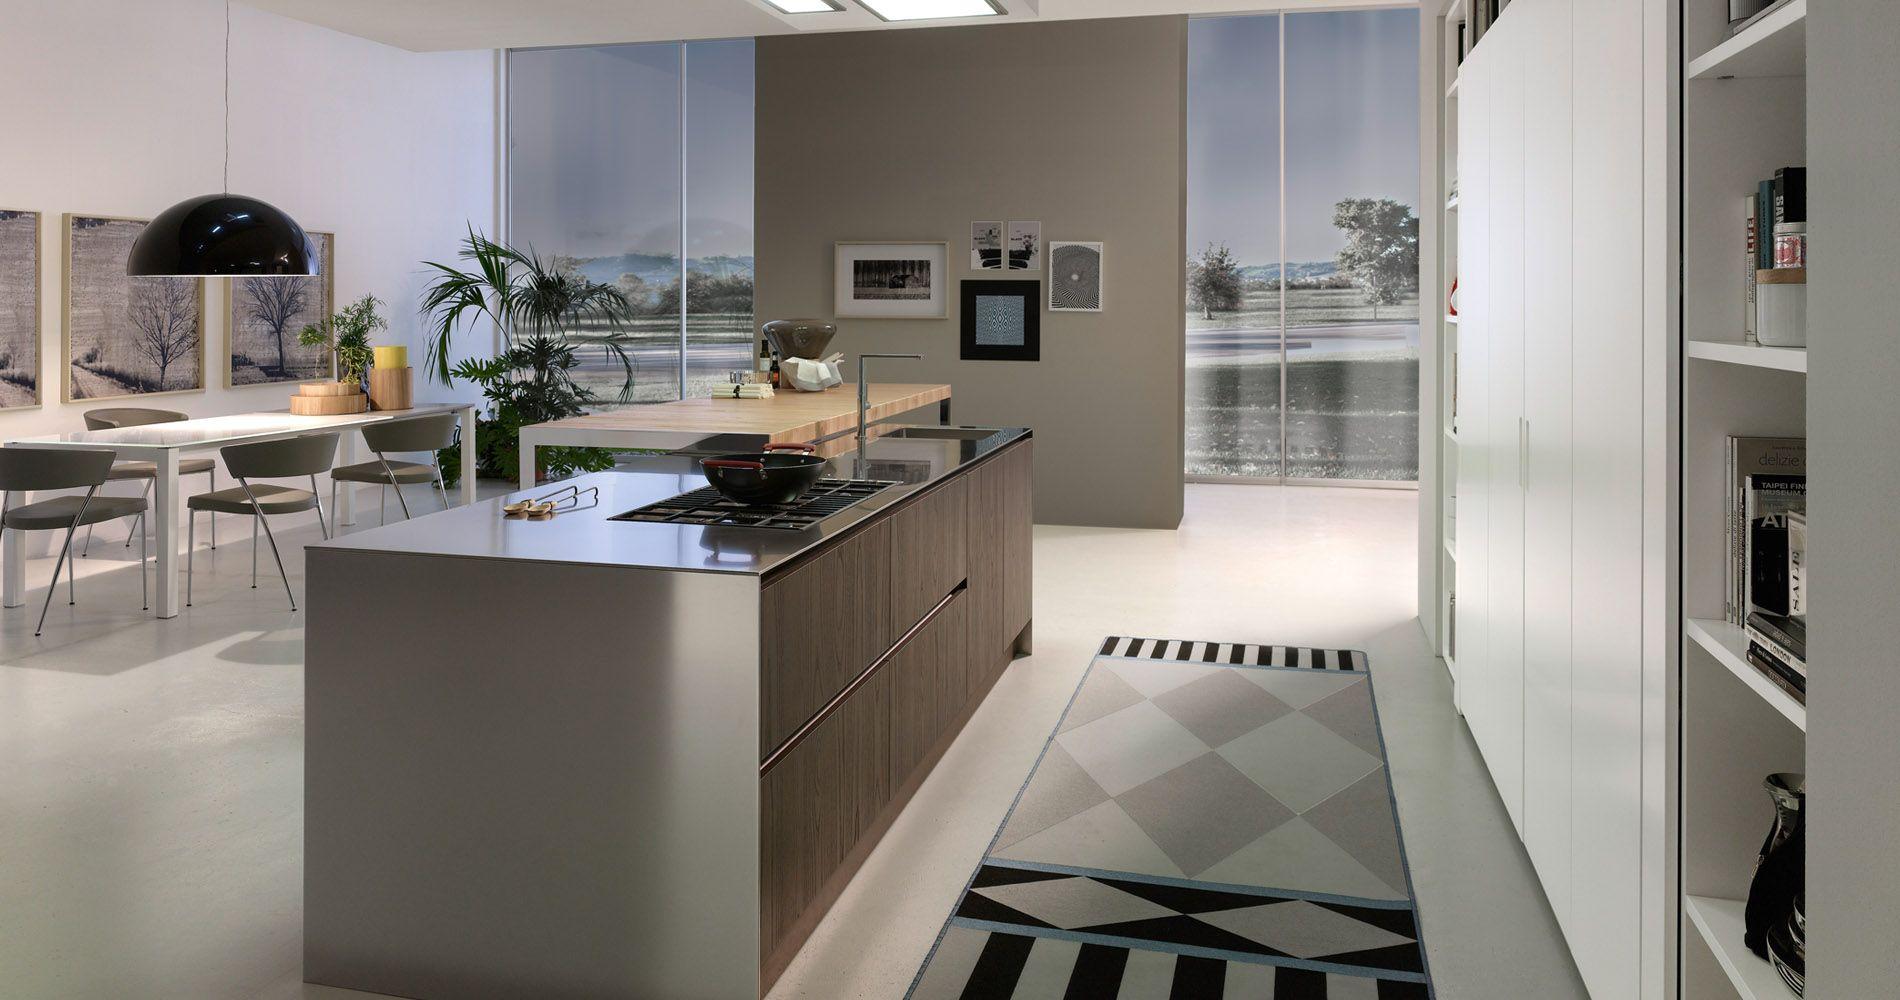 Pedini is the brand behind Kitchen Design